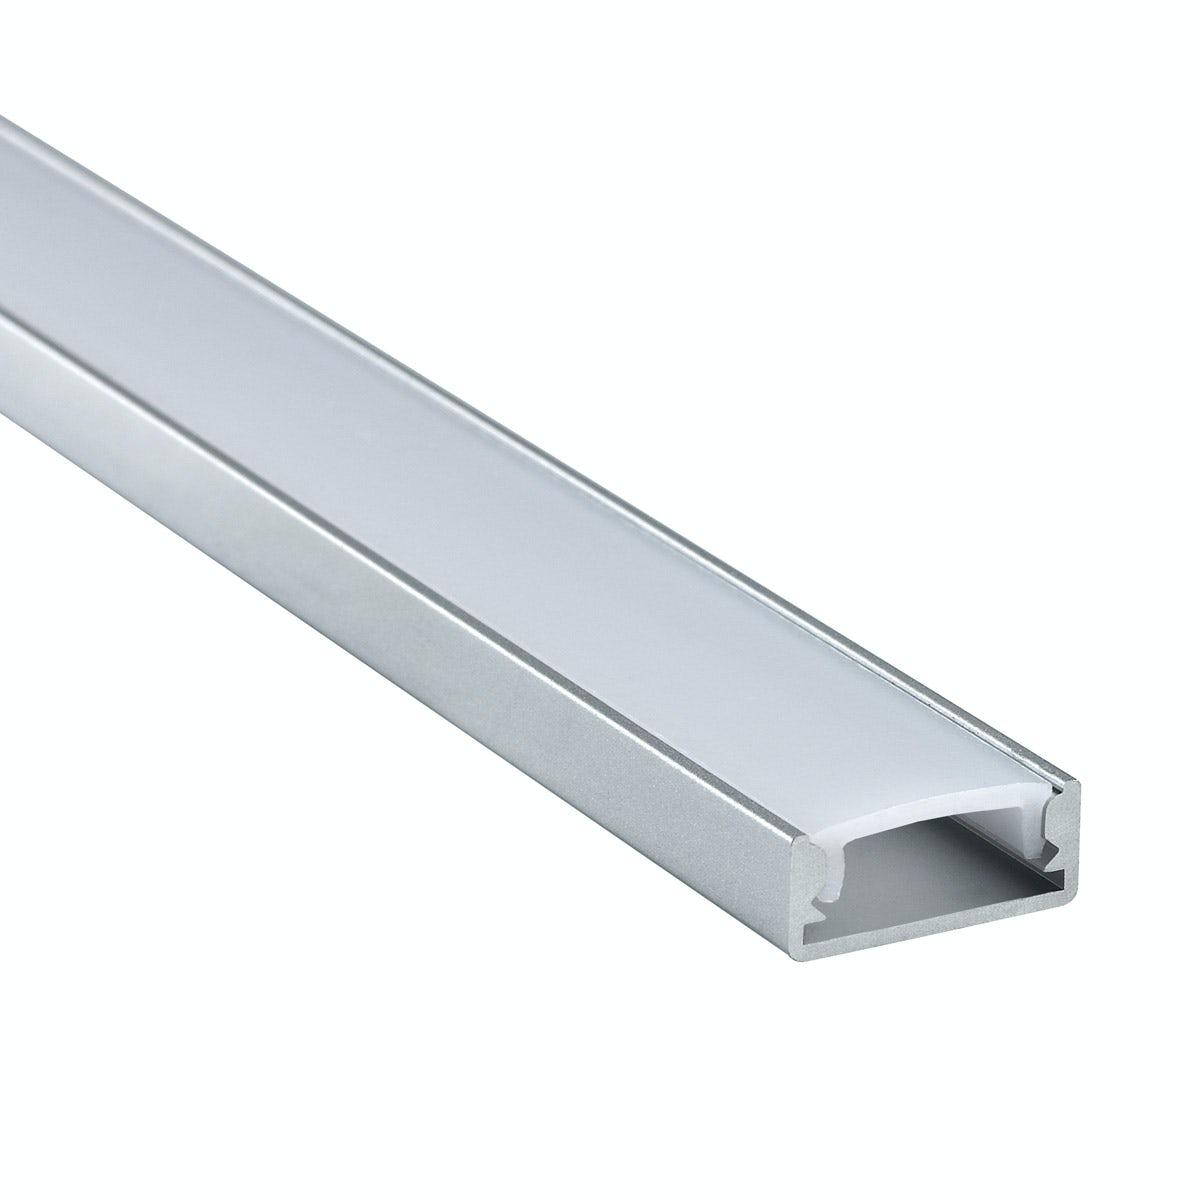 Mode Surface mounted aluminium profile 2m